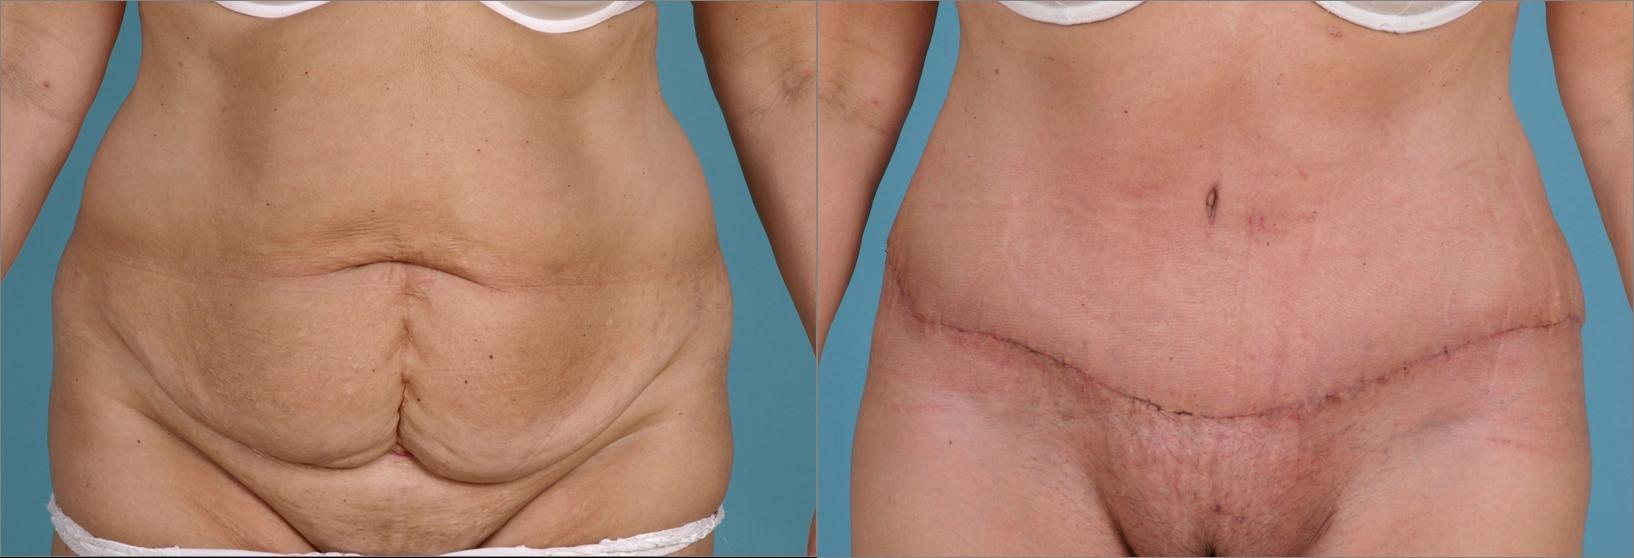 Penisvergrerung in Kln - Plastische Chirurgie Kln